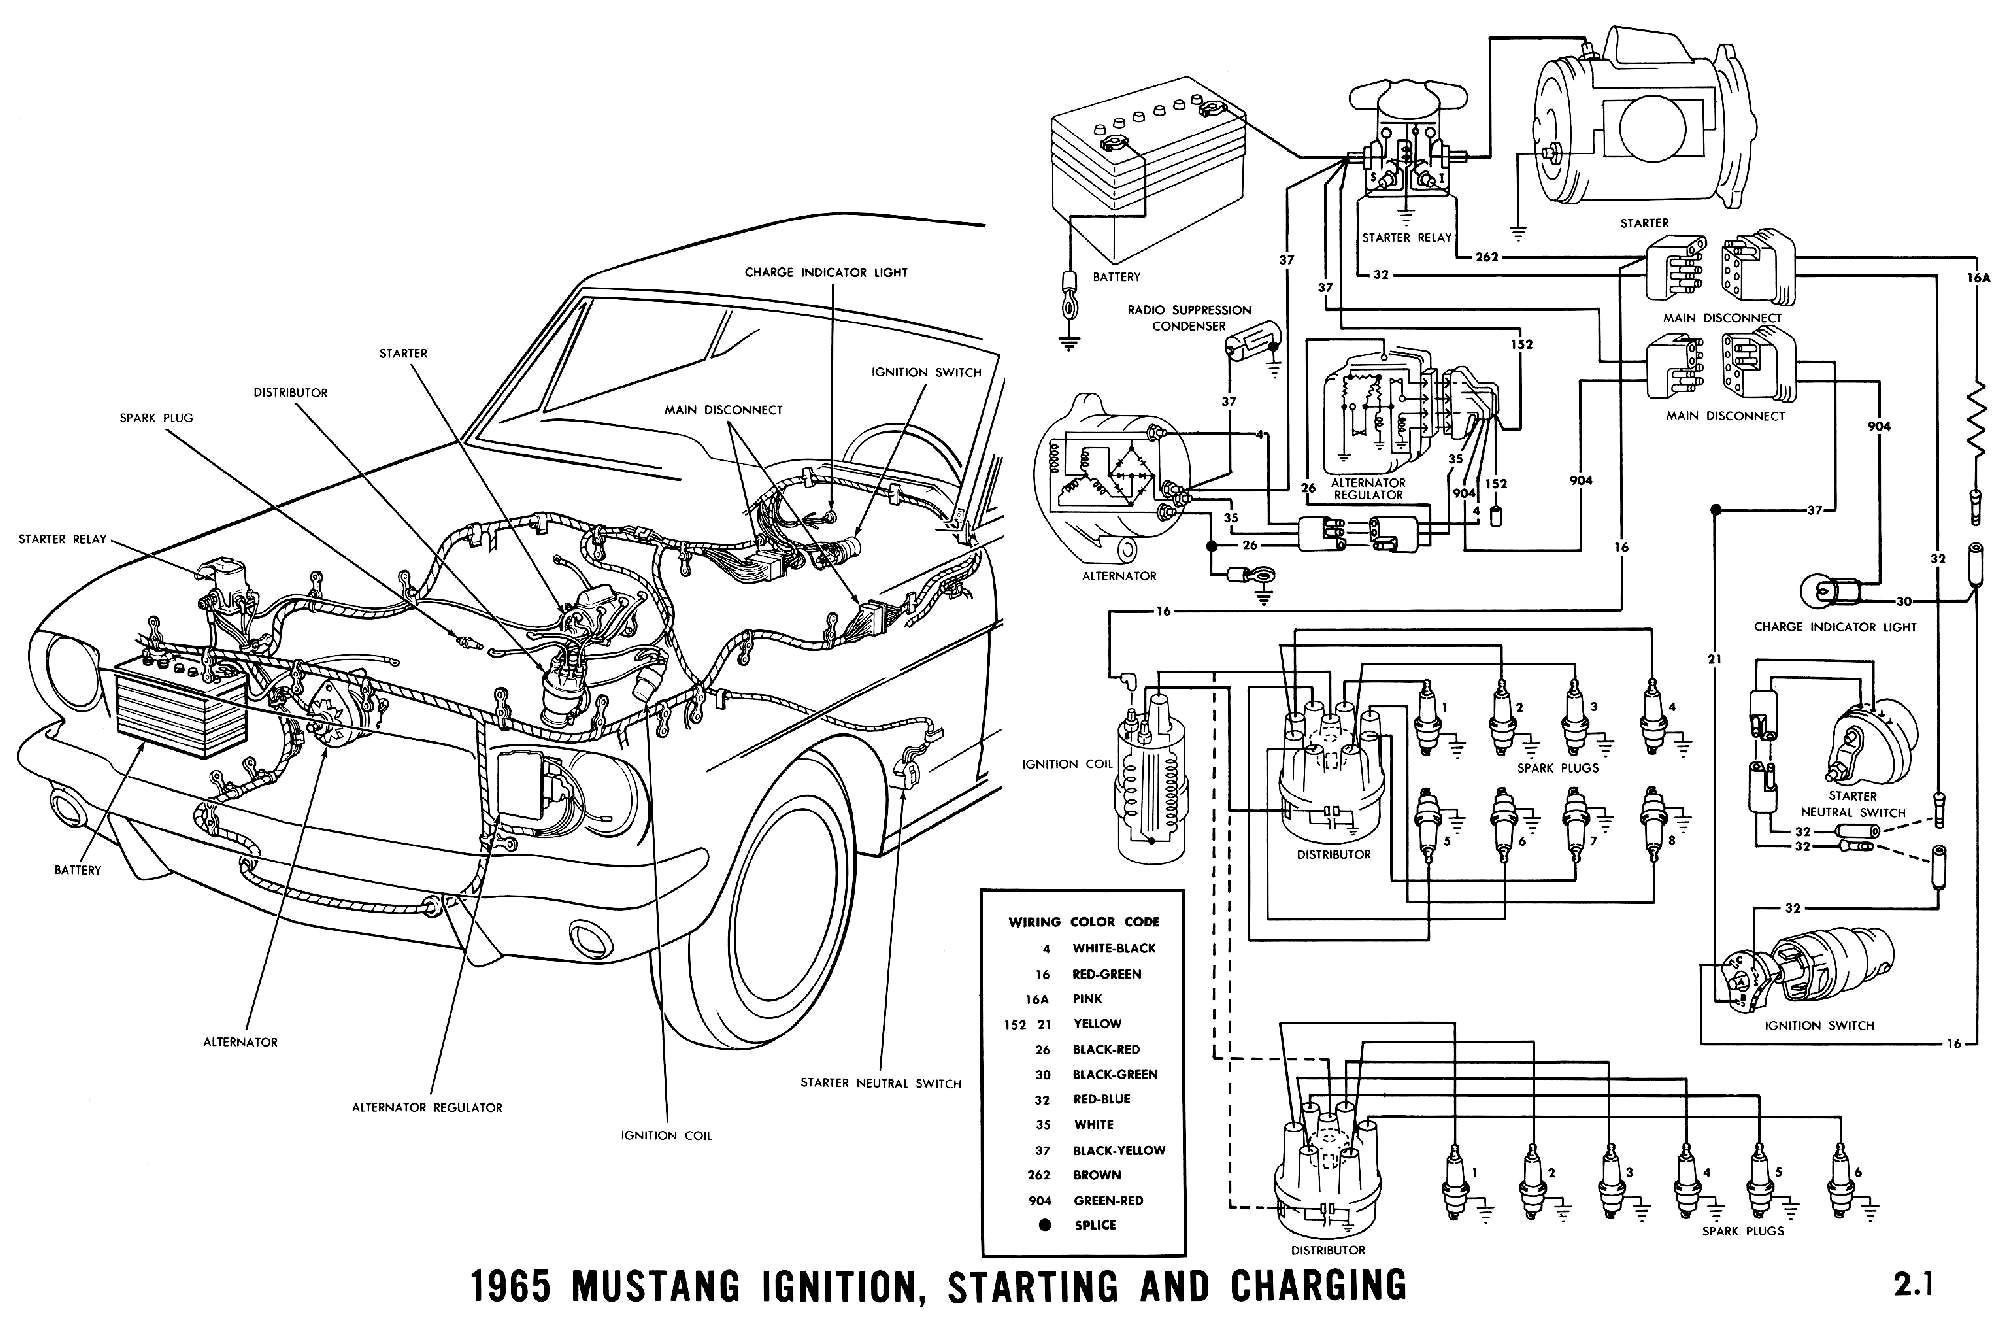 Find Comprehensive Diagram Of Car Parts Car Parts Names with Diagram Pics Of Find Comprehensive Diagram Of Car Parts